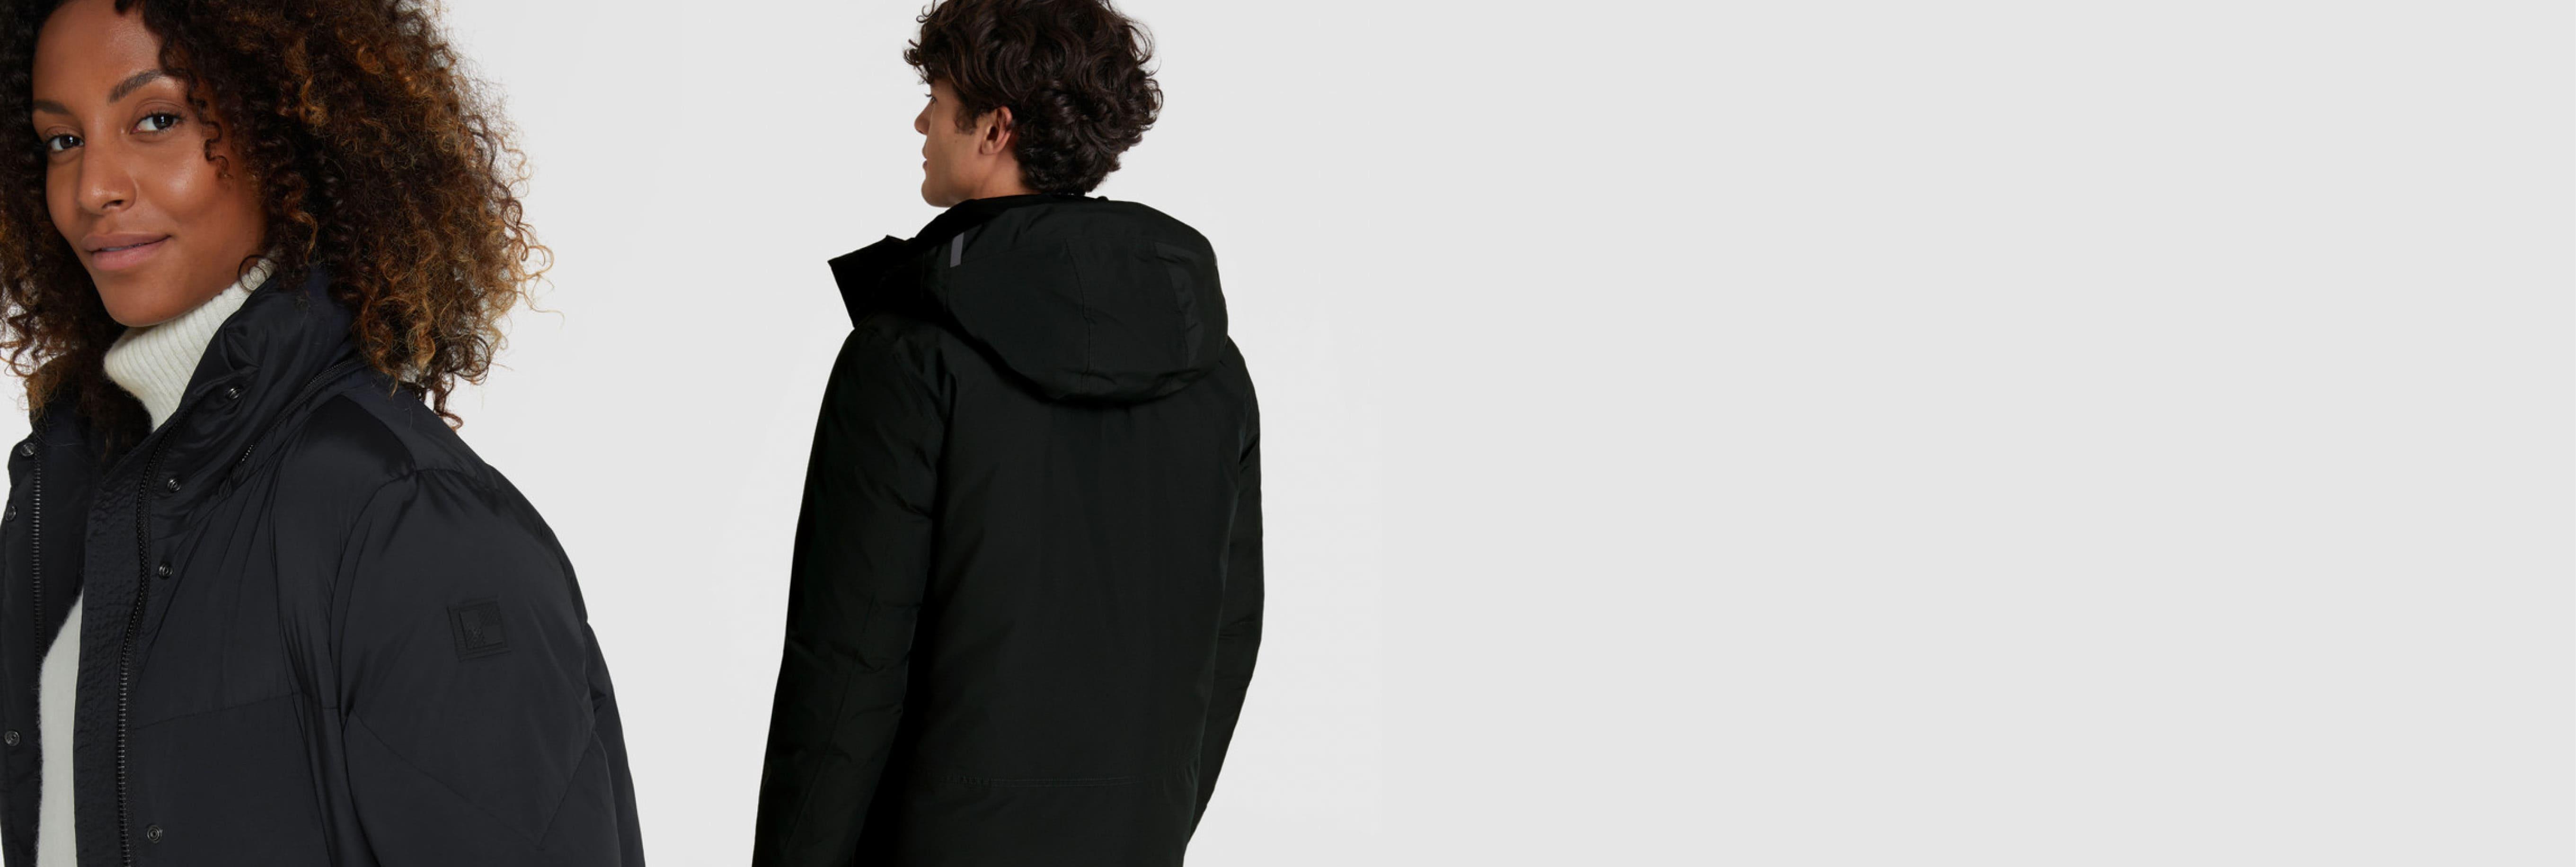 Kampanj kläder